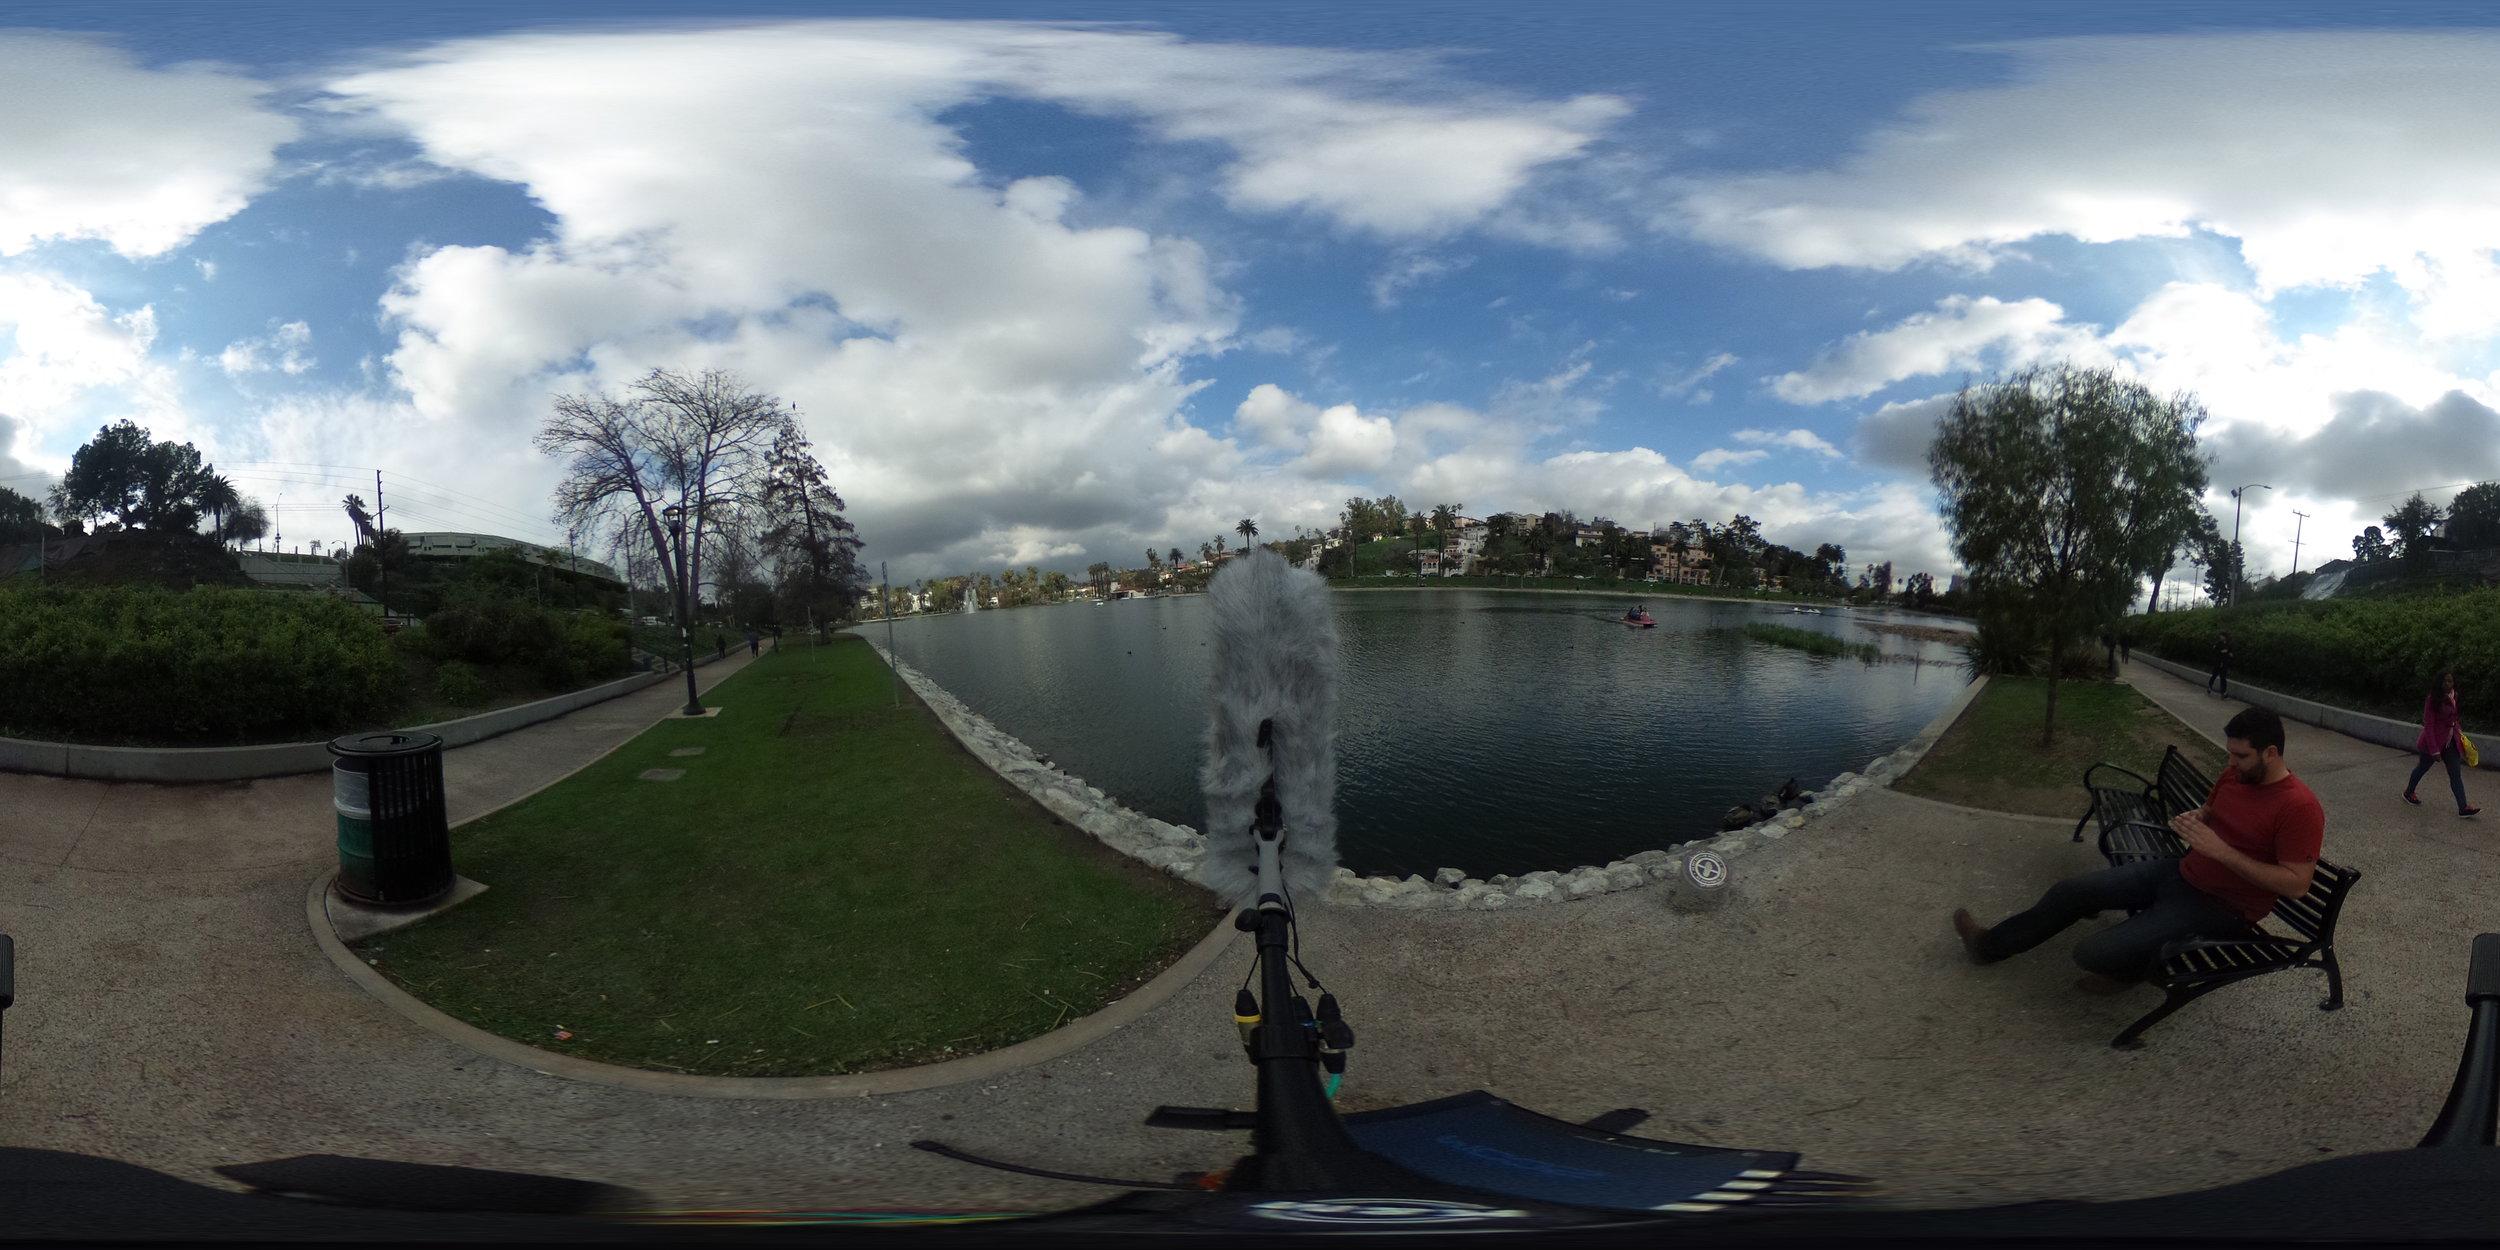 EXT_Day_CityPark_NearbyBusyStreet_Lake_Ducks_HeavyPedestrian_DogsWalking_360PictureReference.JPG